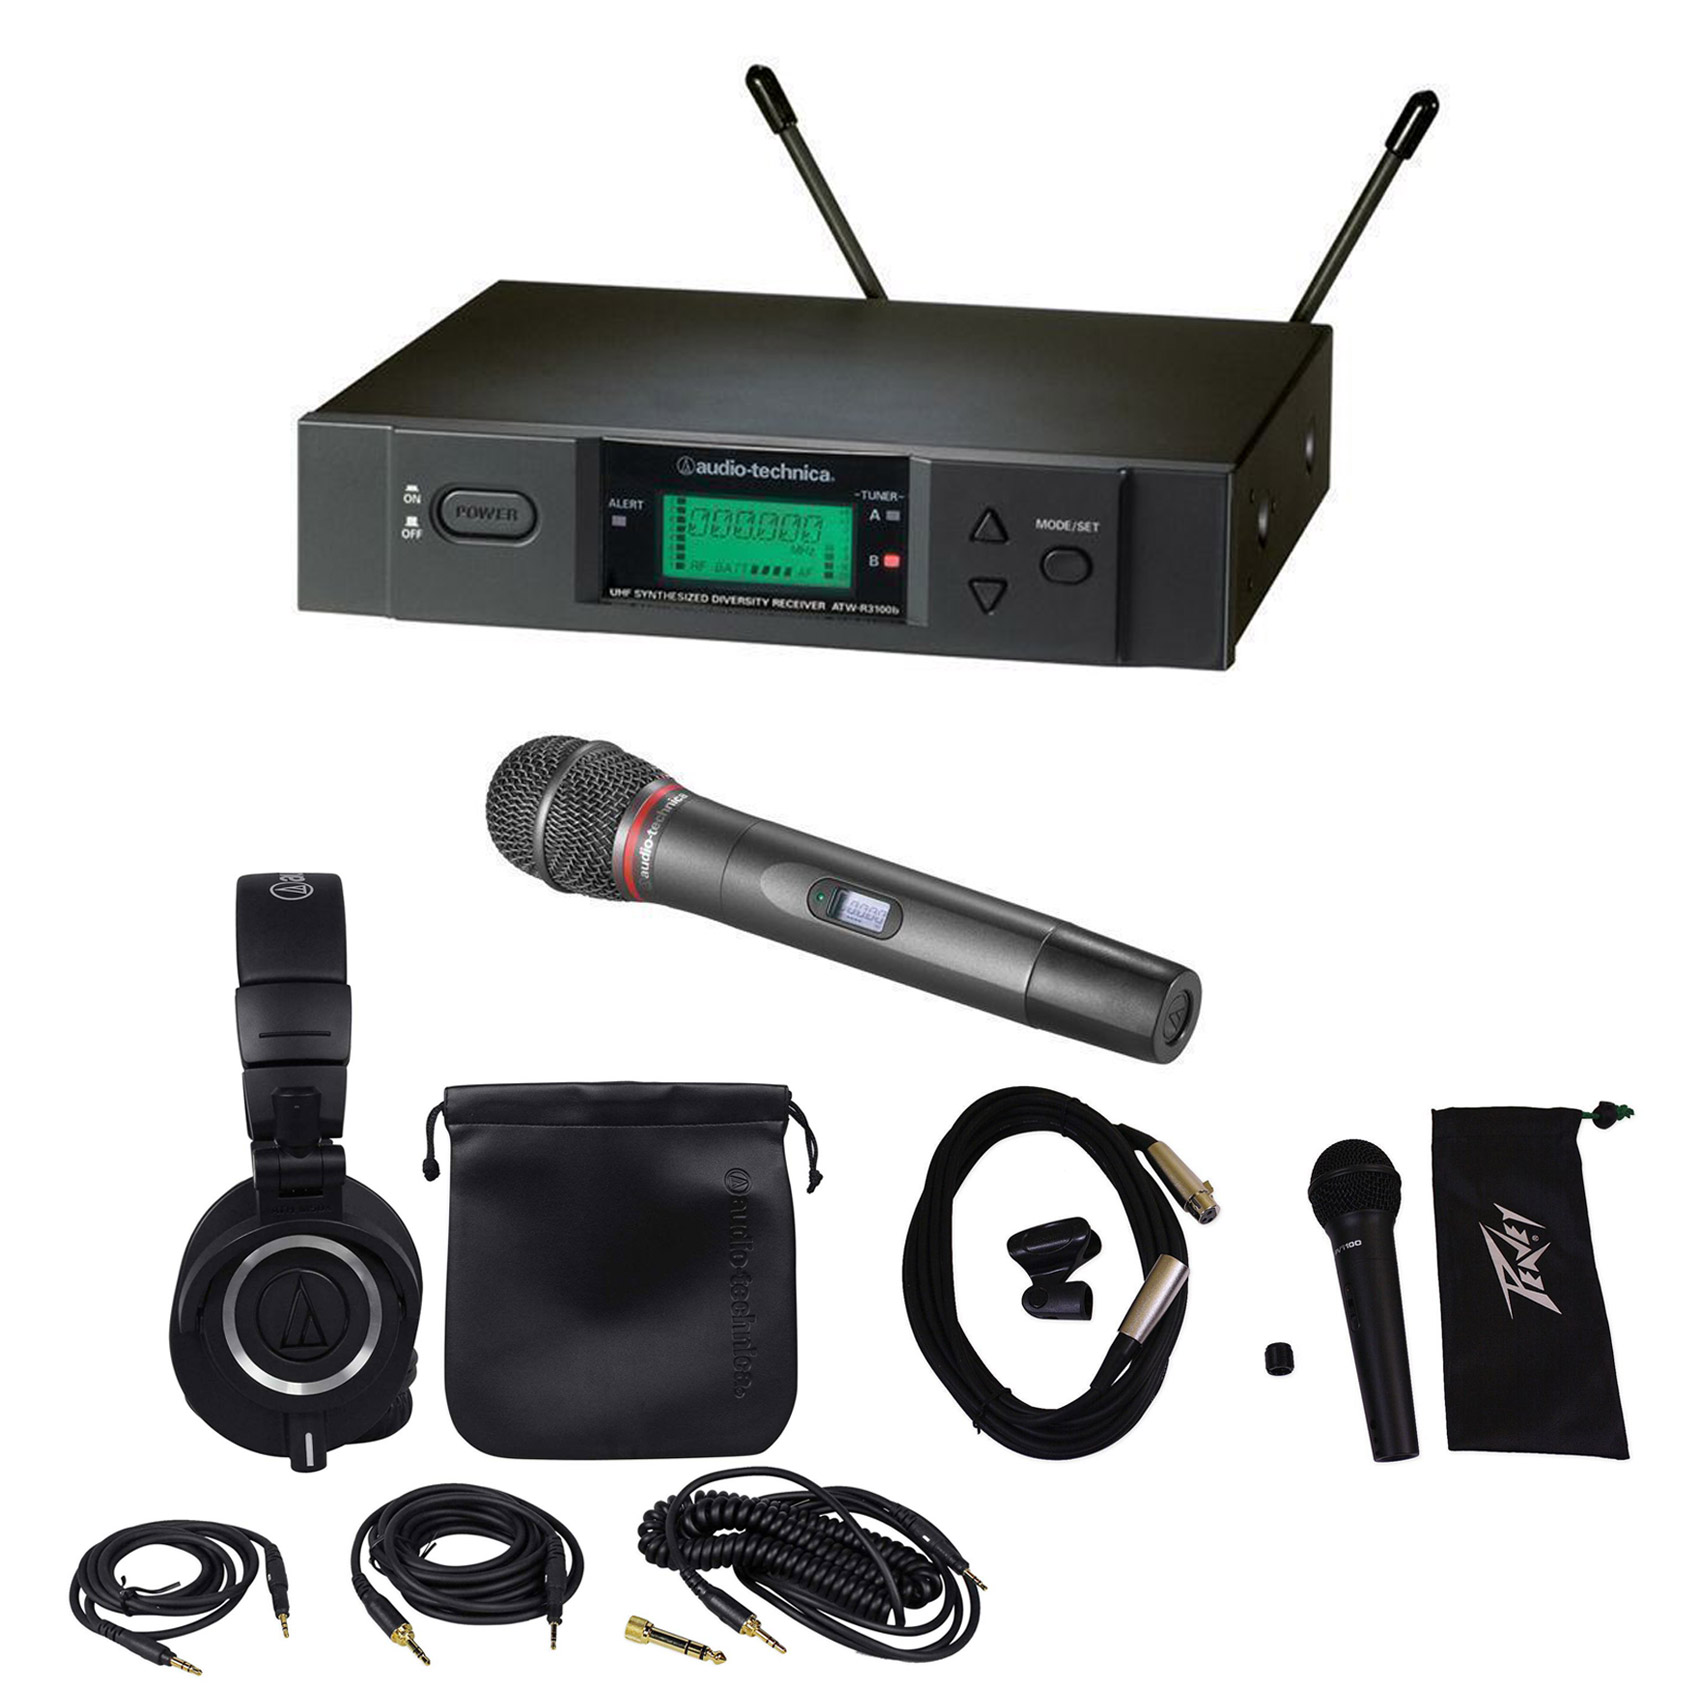 Audio Technica ATW-3141BD UHF Wireless Handheld Microphone+Headphones+Extra Mic by Audio Technica